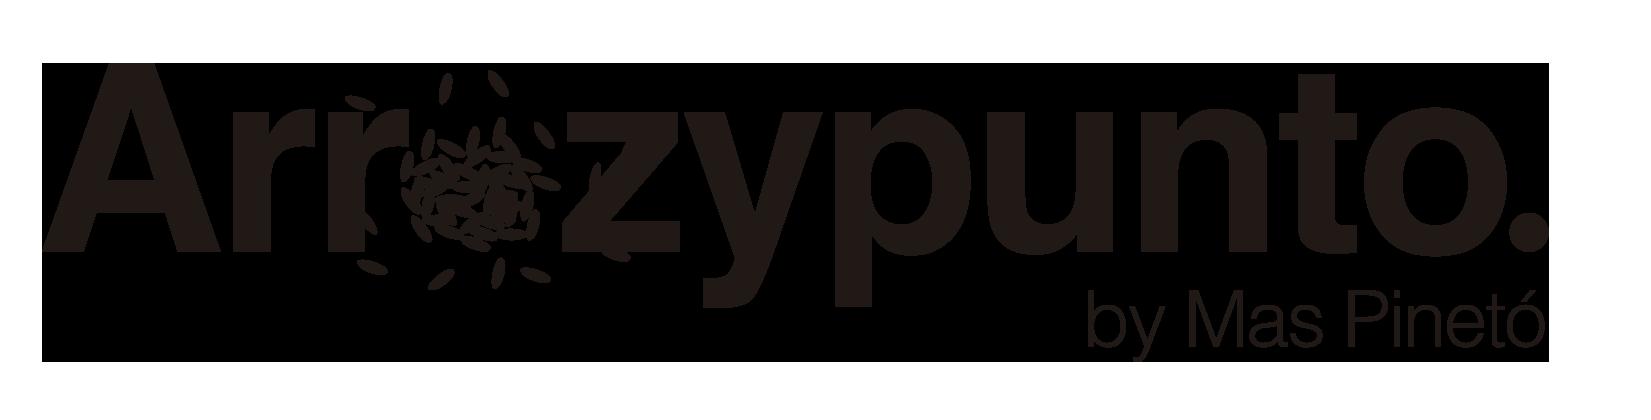 ArrozyPunto.com – Comida a domicilio